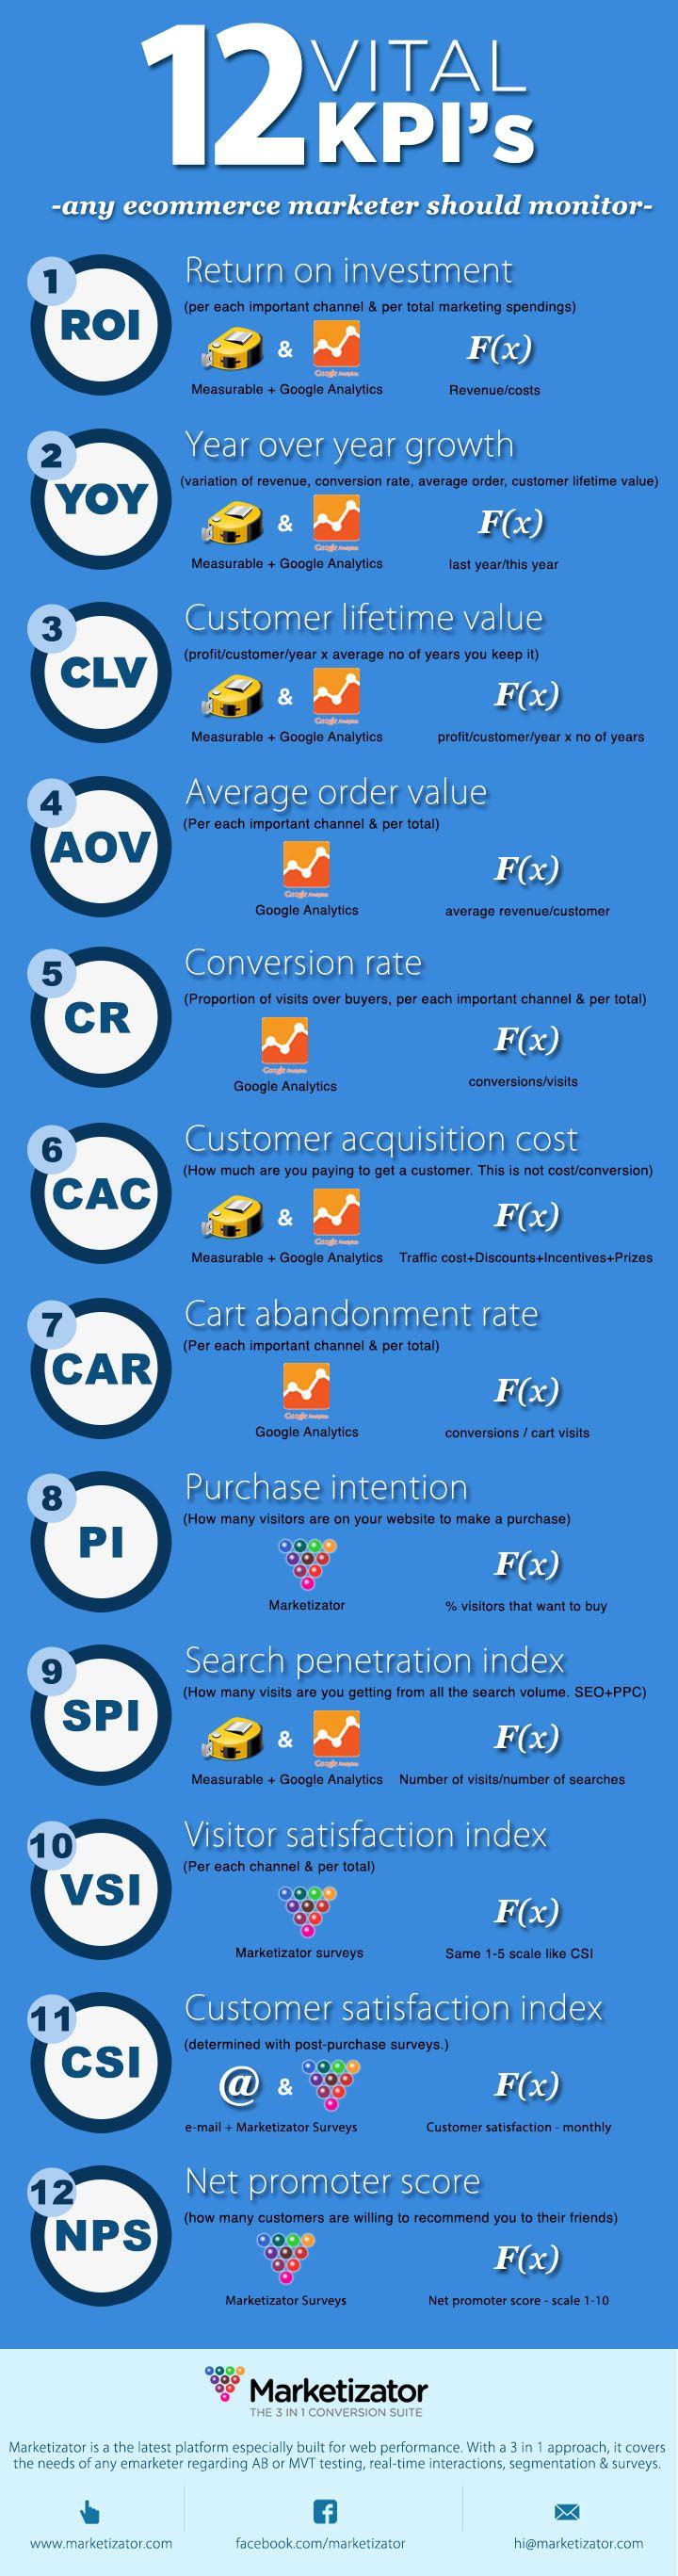 5 KPI's clave para comercio electrónico #infografia #infographic #ecommerce